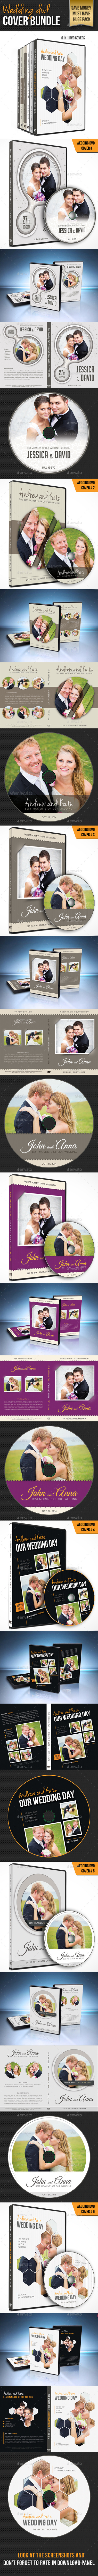 6 in 1 Wedding DVD Cover & Disc Label Bundle - CD & DVD Artwork Print Templates